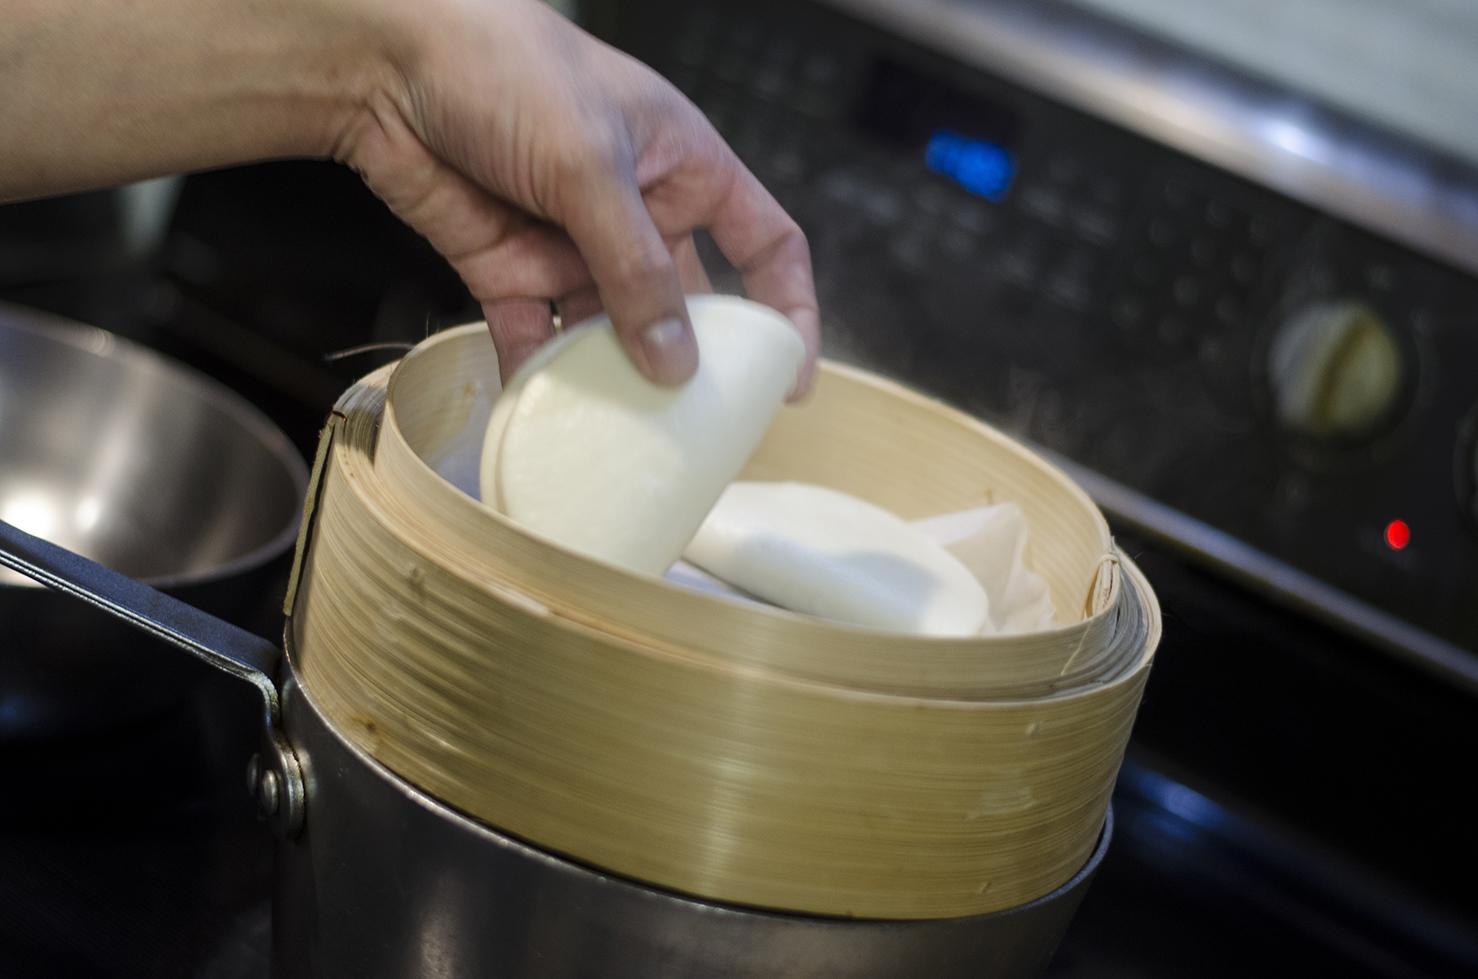 Steam them buns!